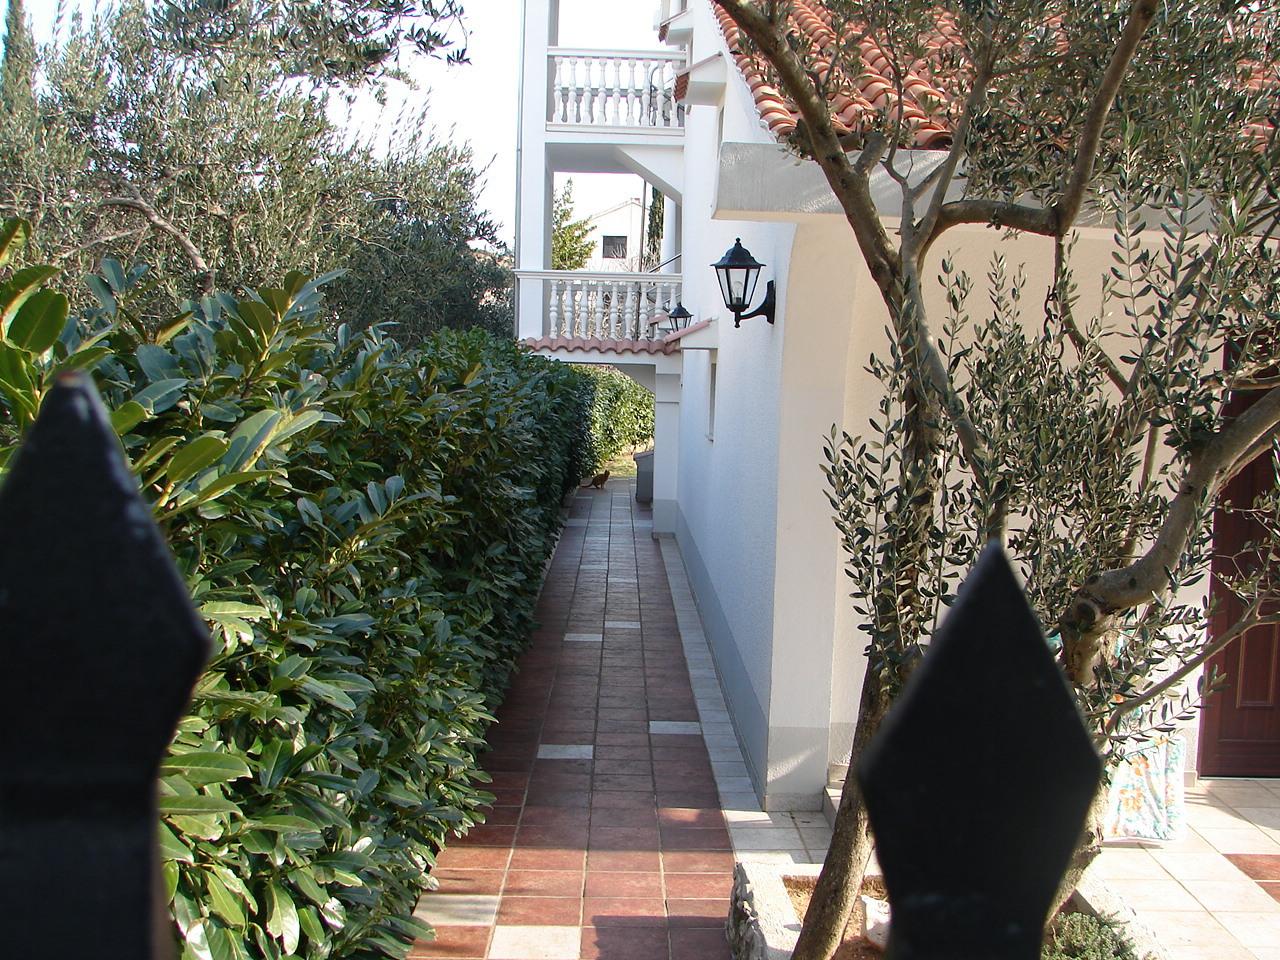 01006PIRO - Pirovac - Apartments Croatia